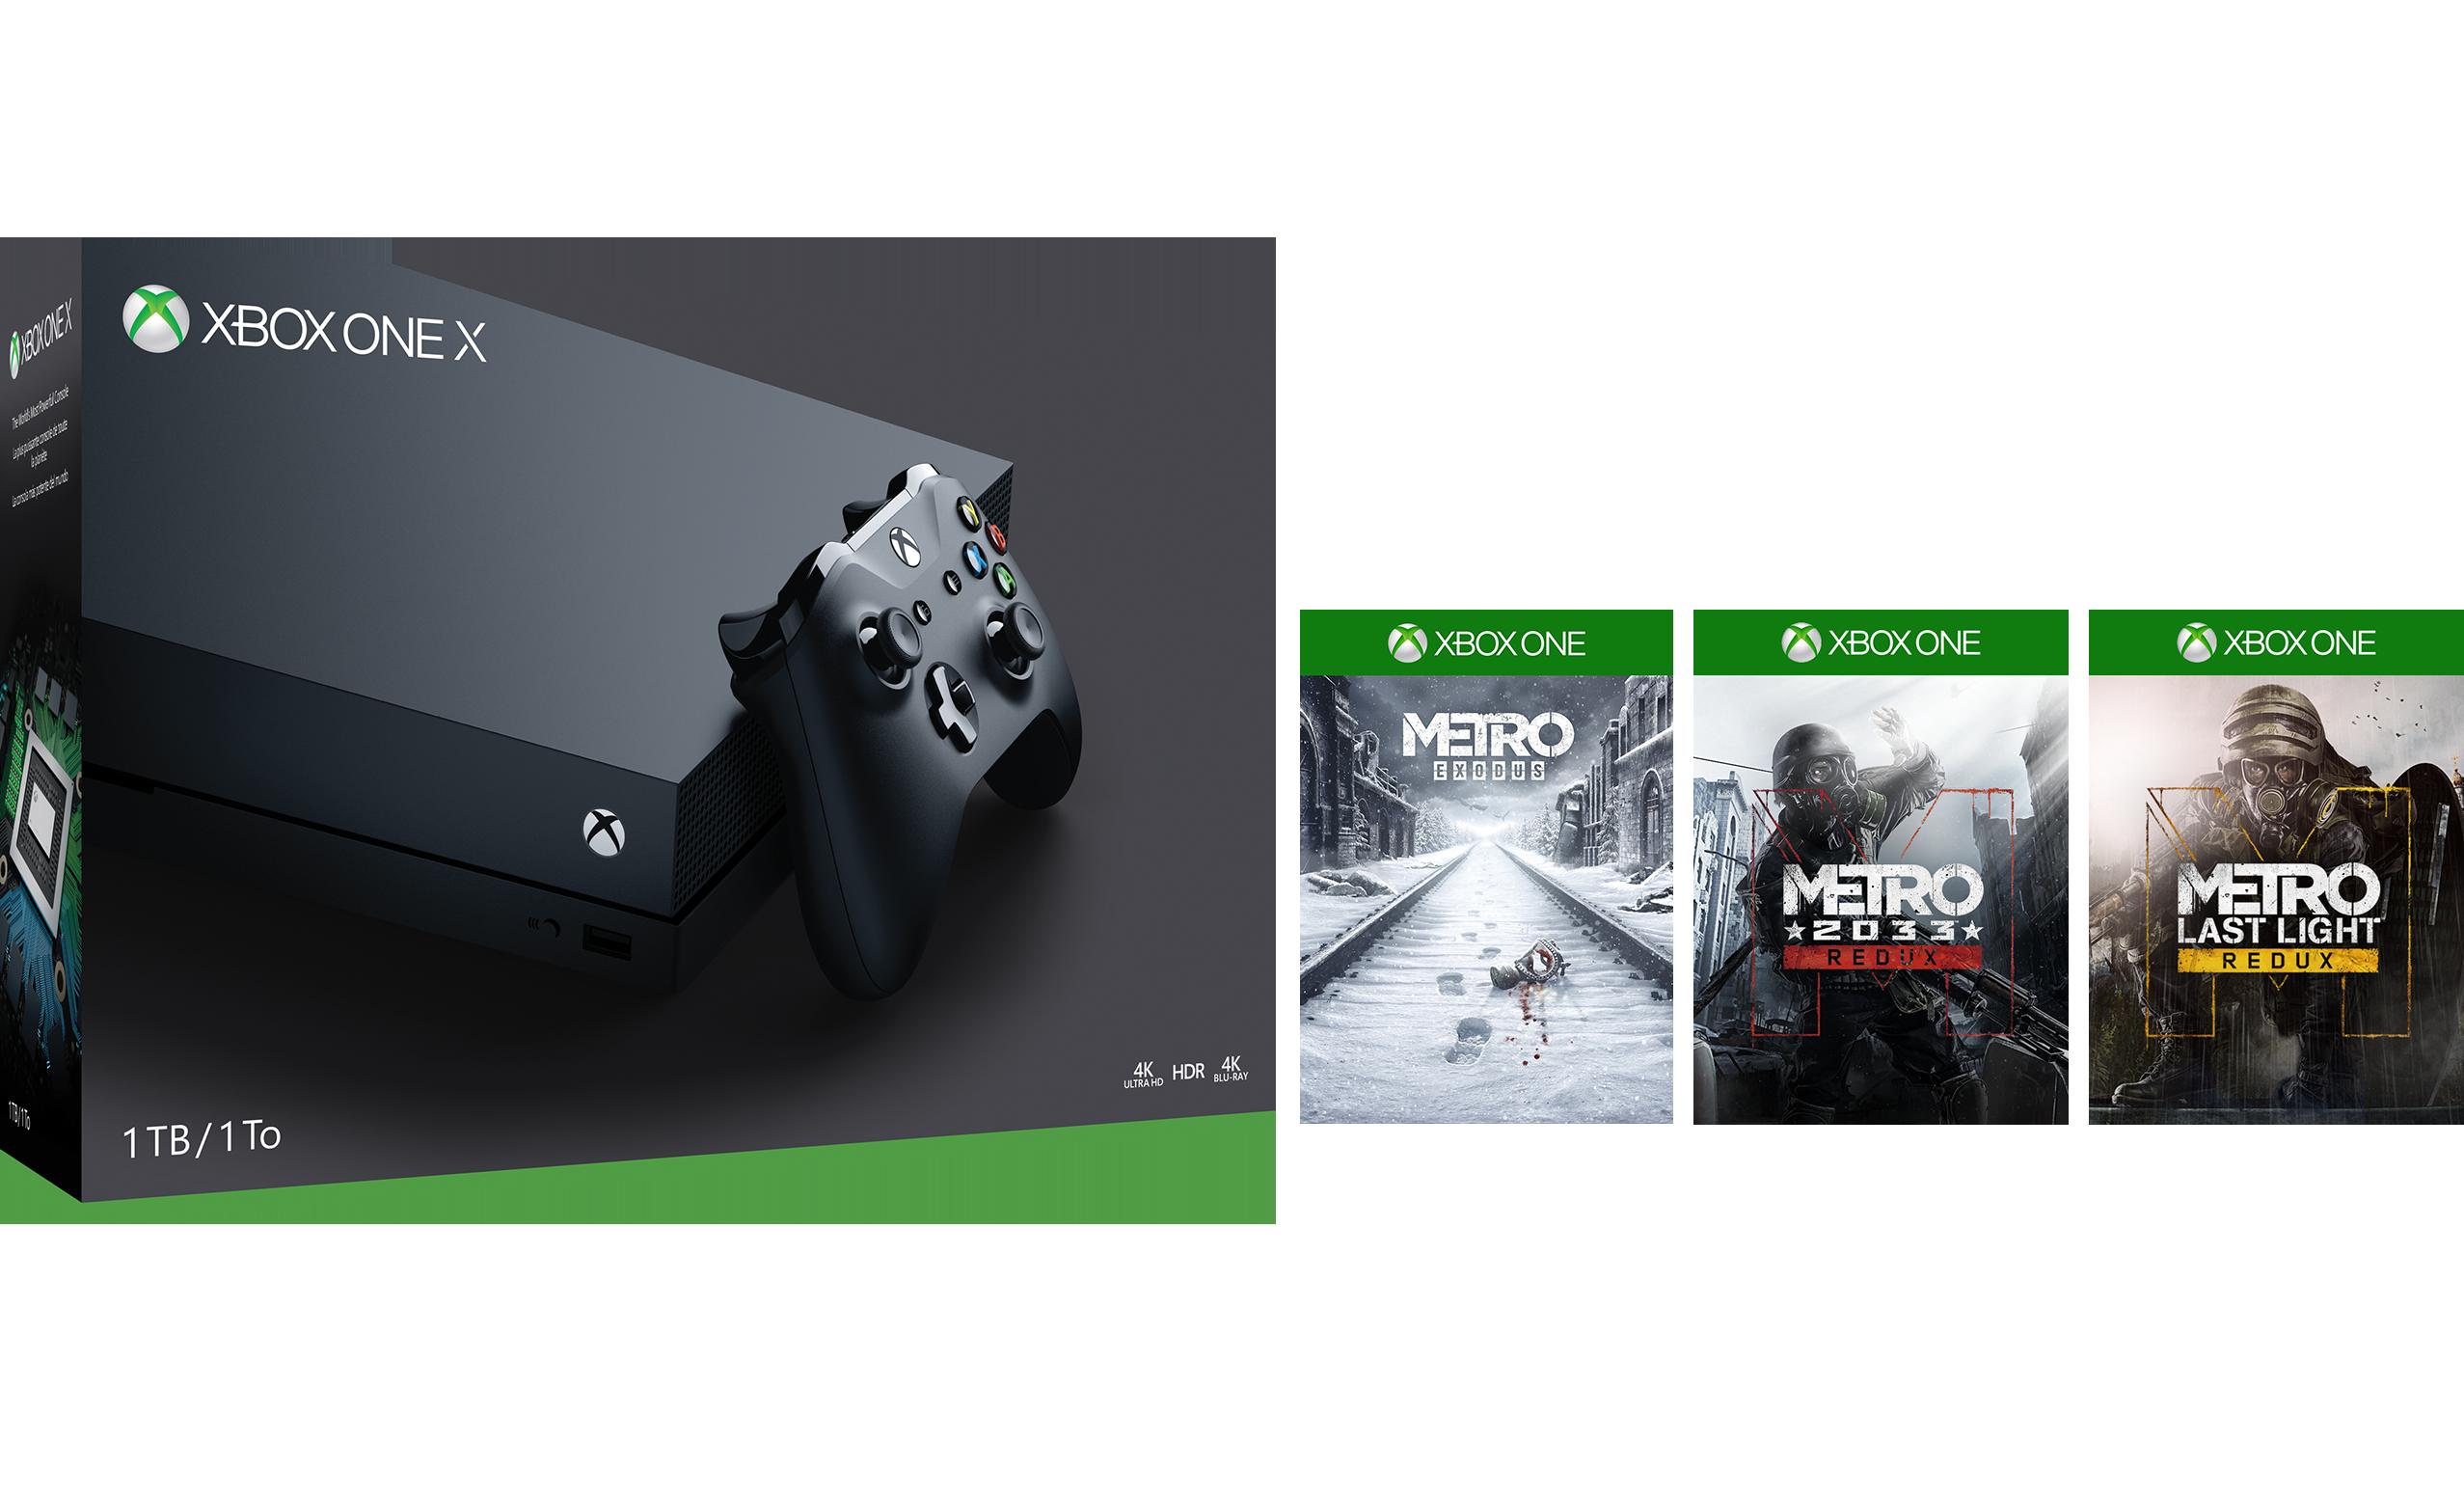 Xbox One X 1TB Console – Metro Saga Bundle